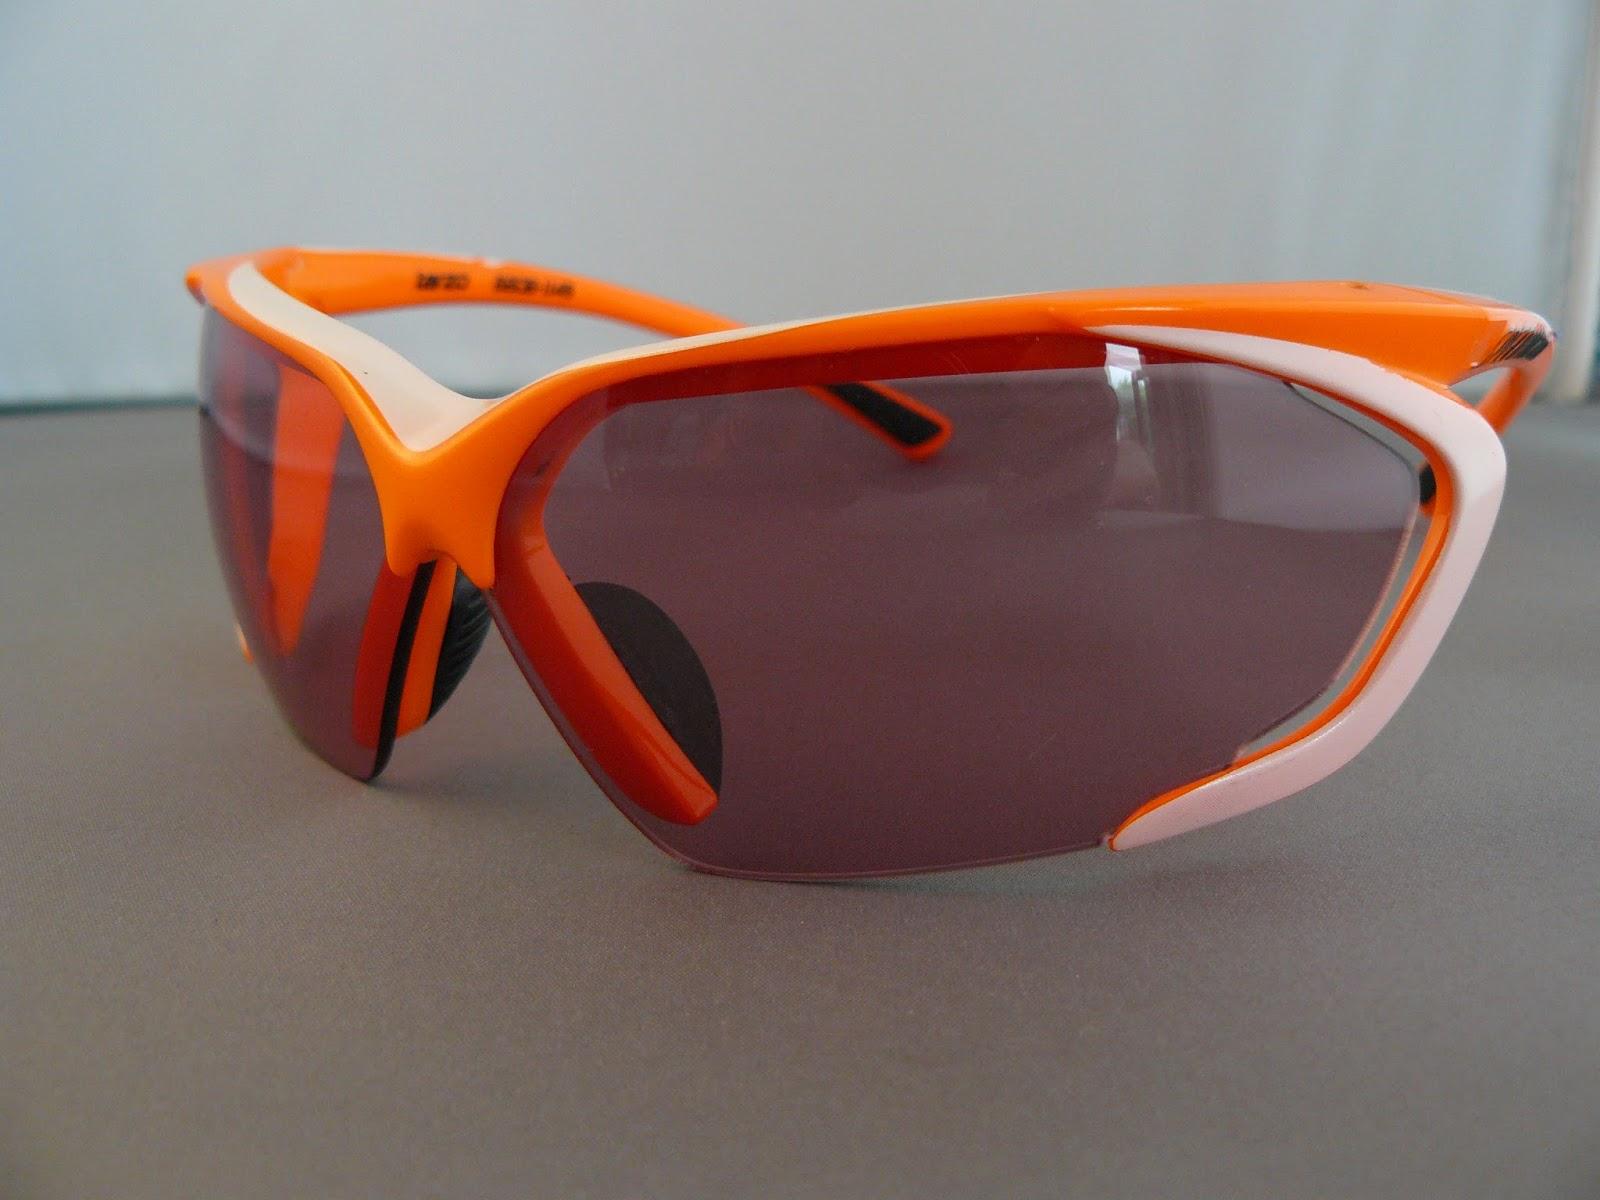 Oakley For Sale Specialized Tarzo Fluo Orange Adaptalite